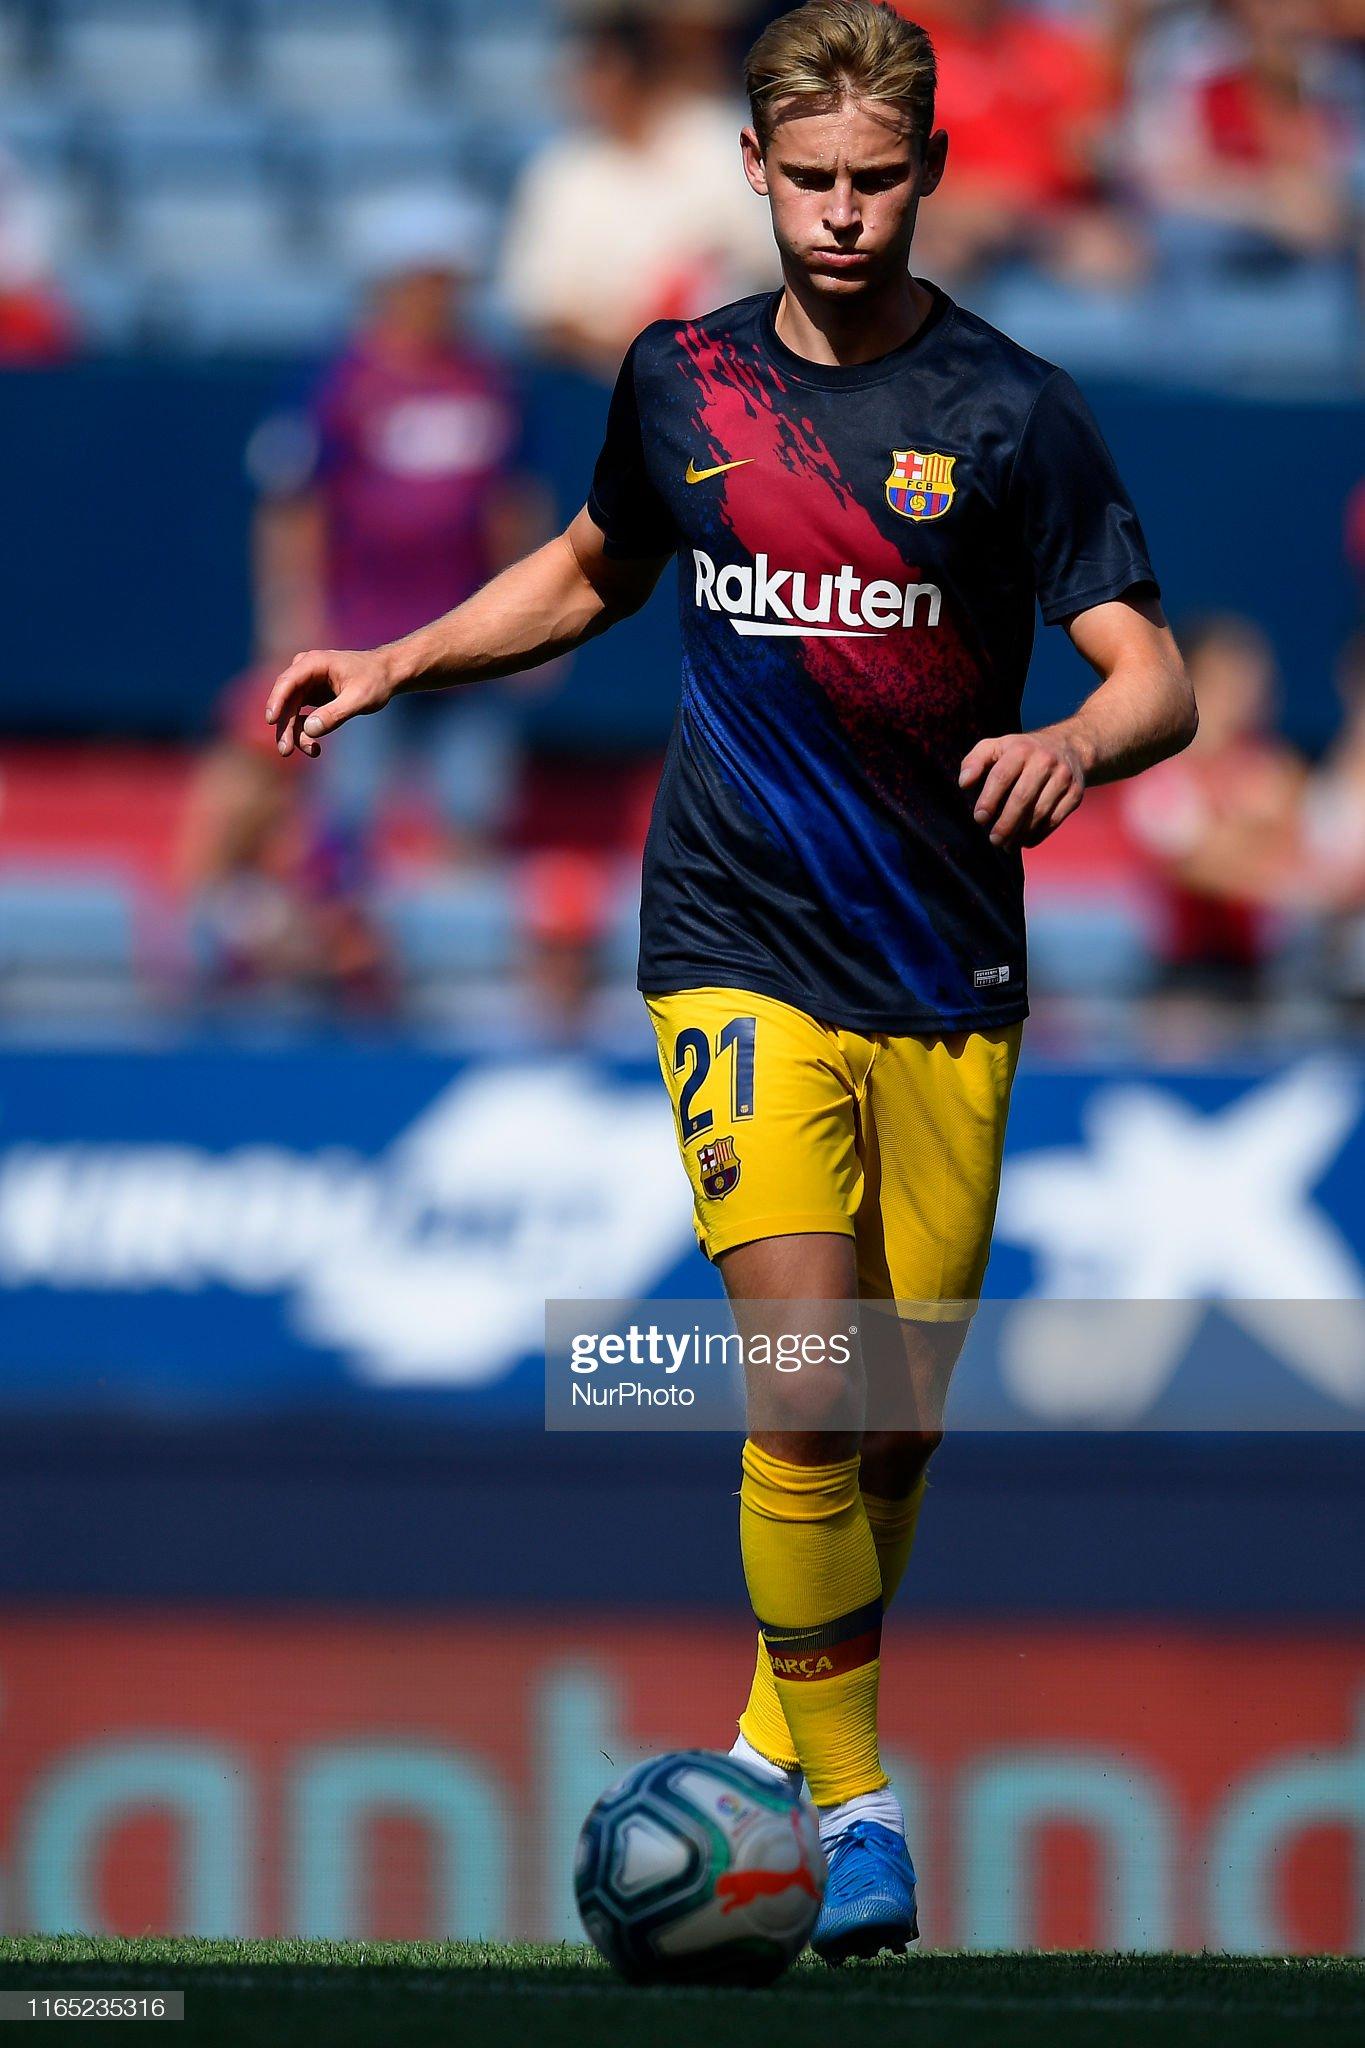 صور مباراة : أوساسونا - برشلونة 2-2 ( 31-08-2019 )  Frenkie-de-jong-of-barcelona-during-the-warmup-before-the-liga-match-picture-id1165235316?s=2048x2048